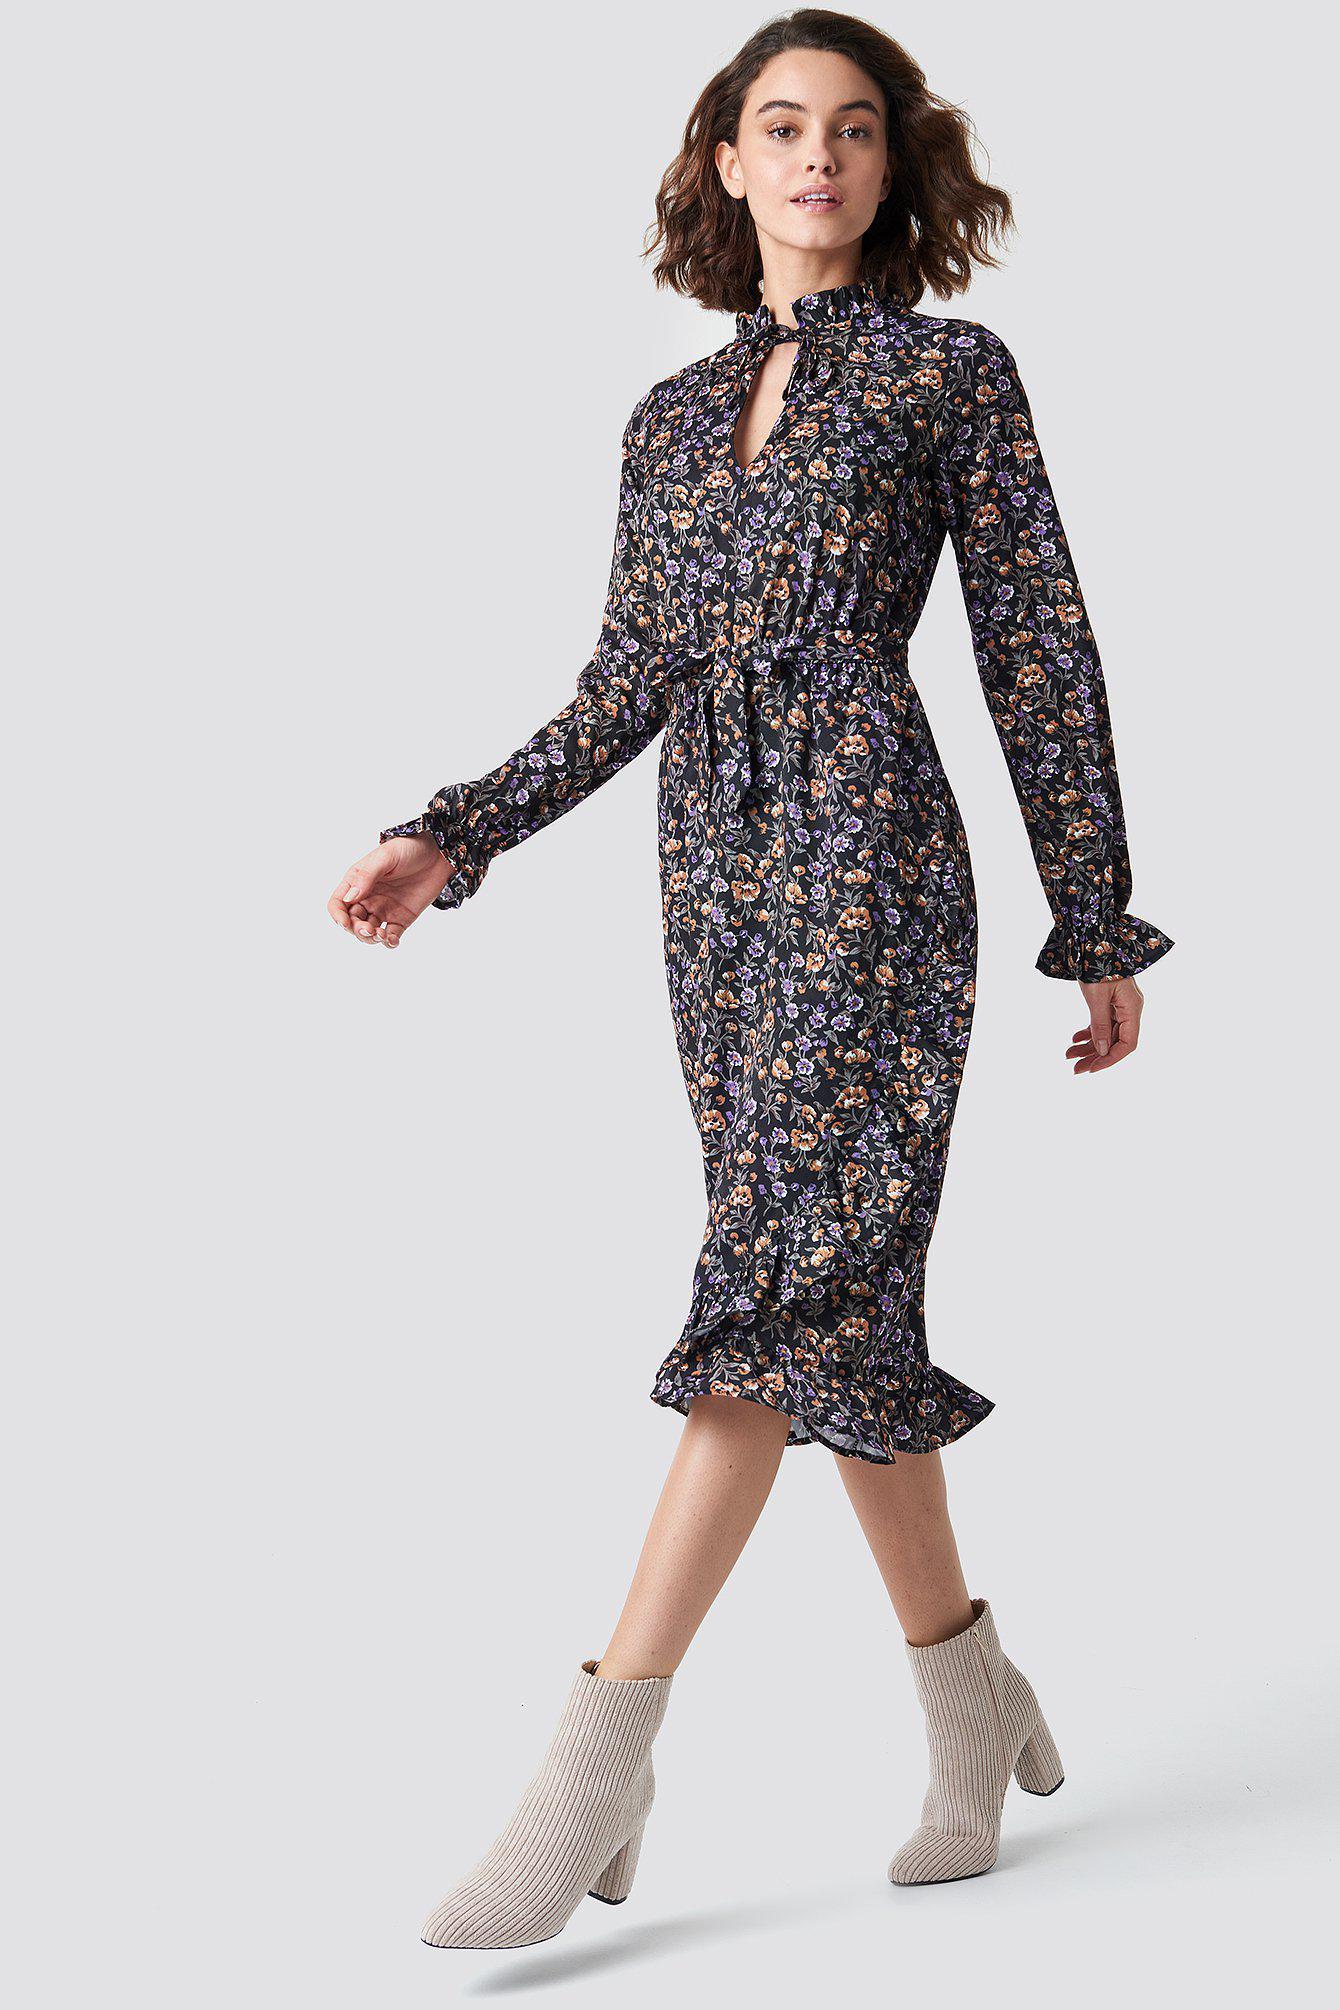 afaa9060b6 Rut&Circle. Women's Black Maxi Flower Dress Flower Print. $48 From NA-KD